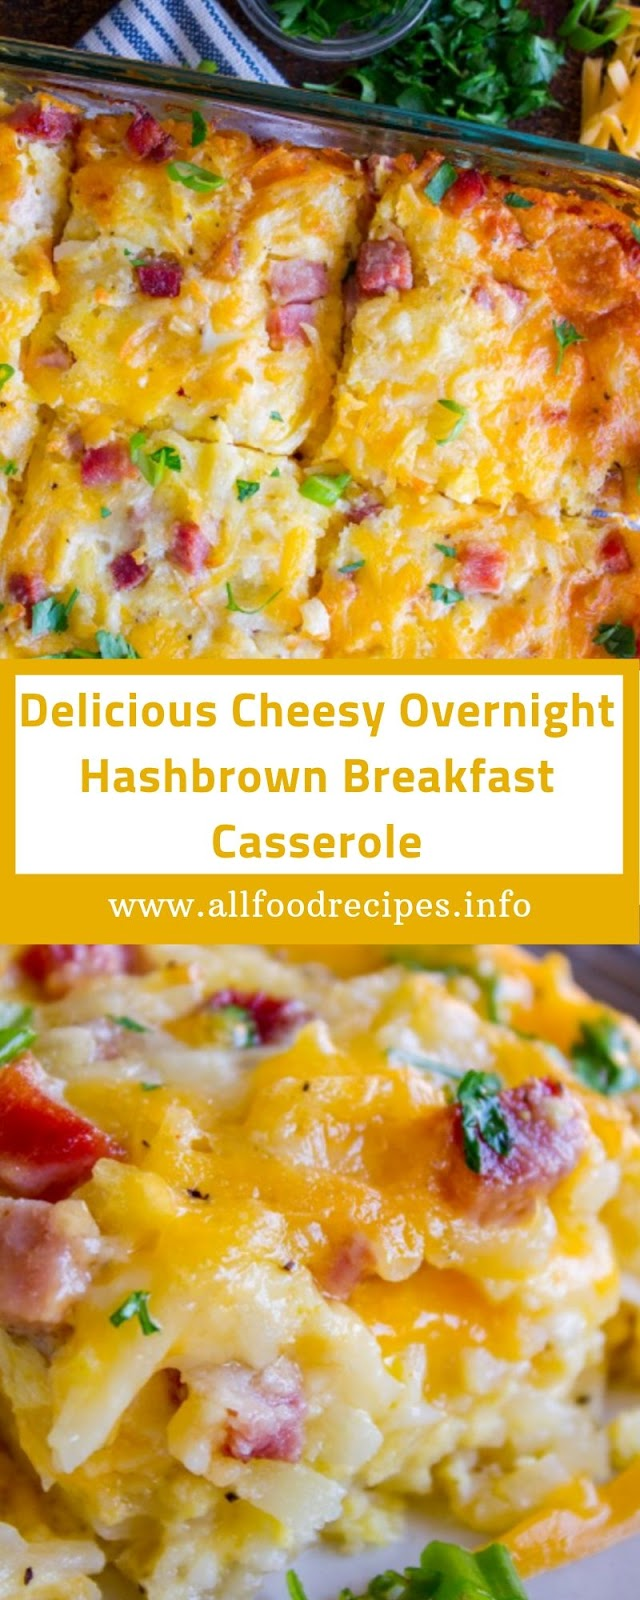 Delicious Cheesy Overnight Hashbrown Breakfast Casserole